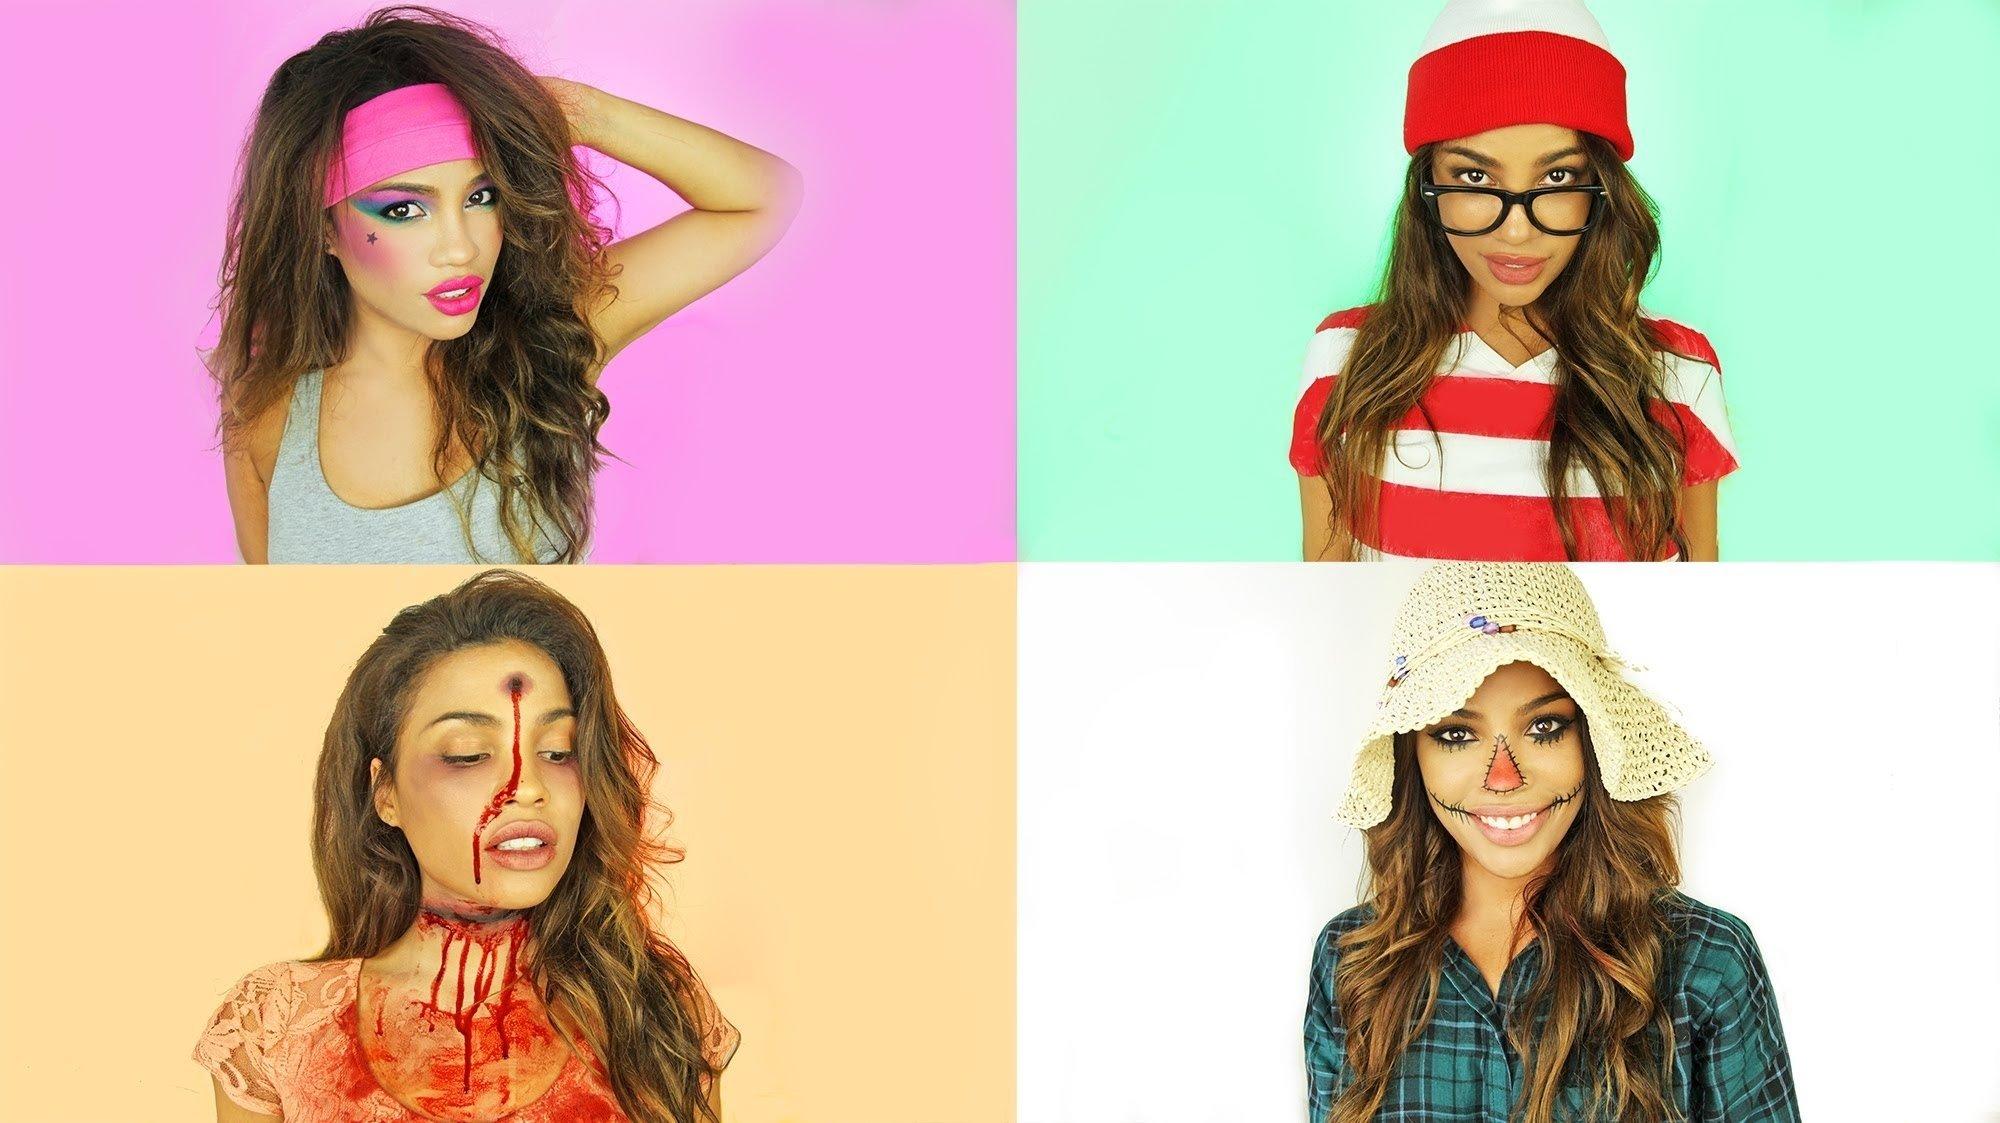 10 Amazing Easy Homemade Halloween Costume Ideas easy diy halloween costumes ideas andreaschoice youtube 6